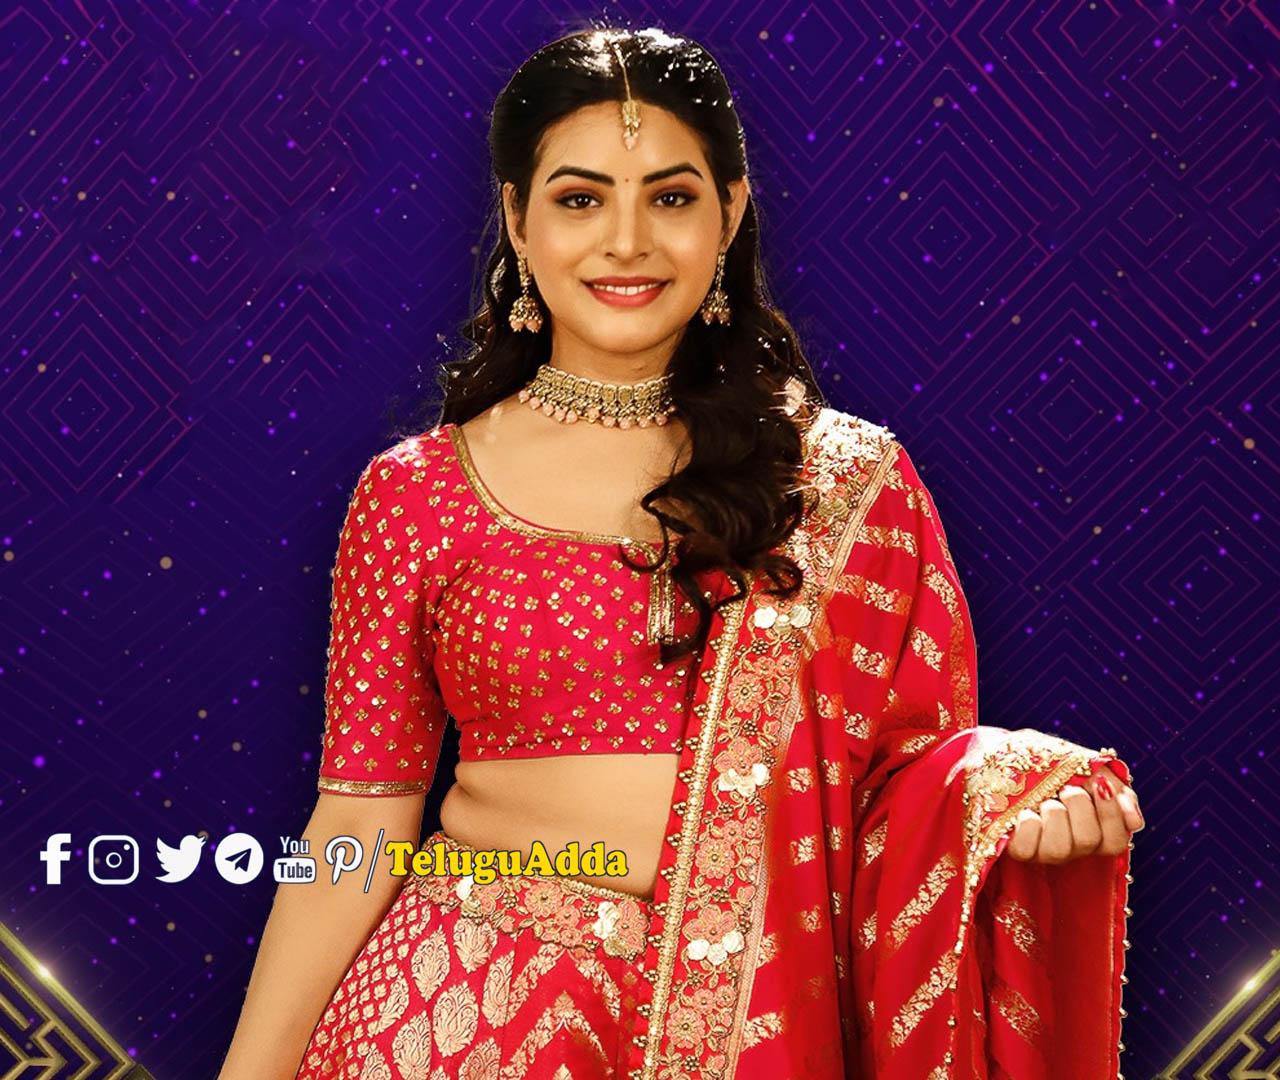 Bigg Boss 5 Telugu 9th contestant Priyanka